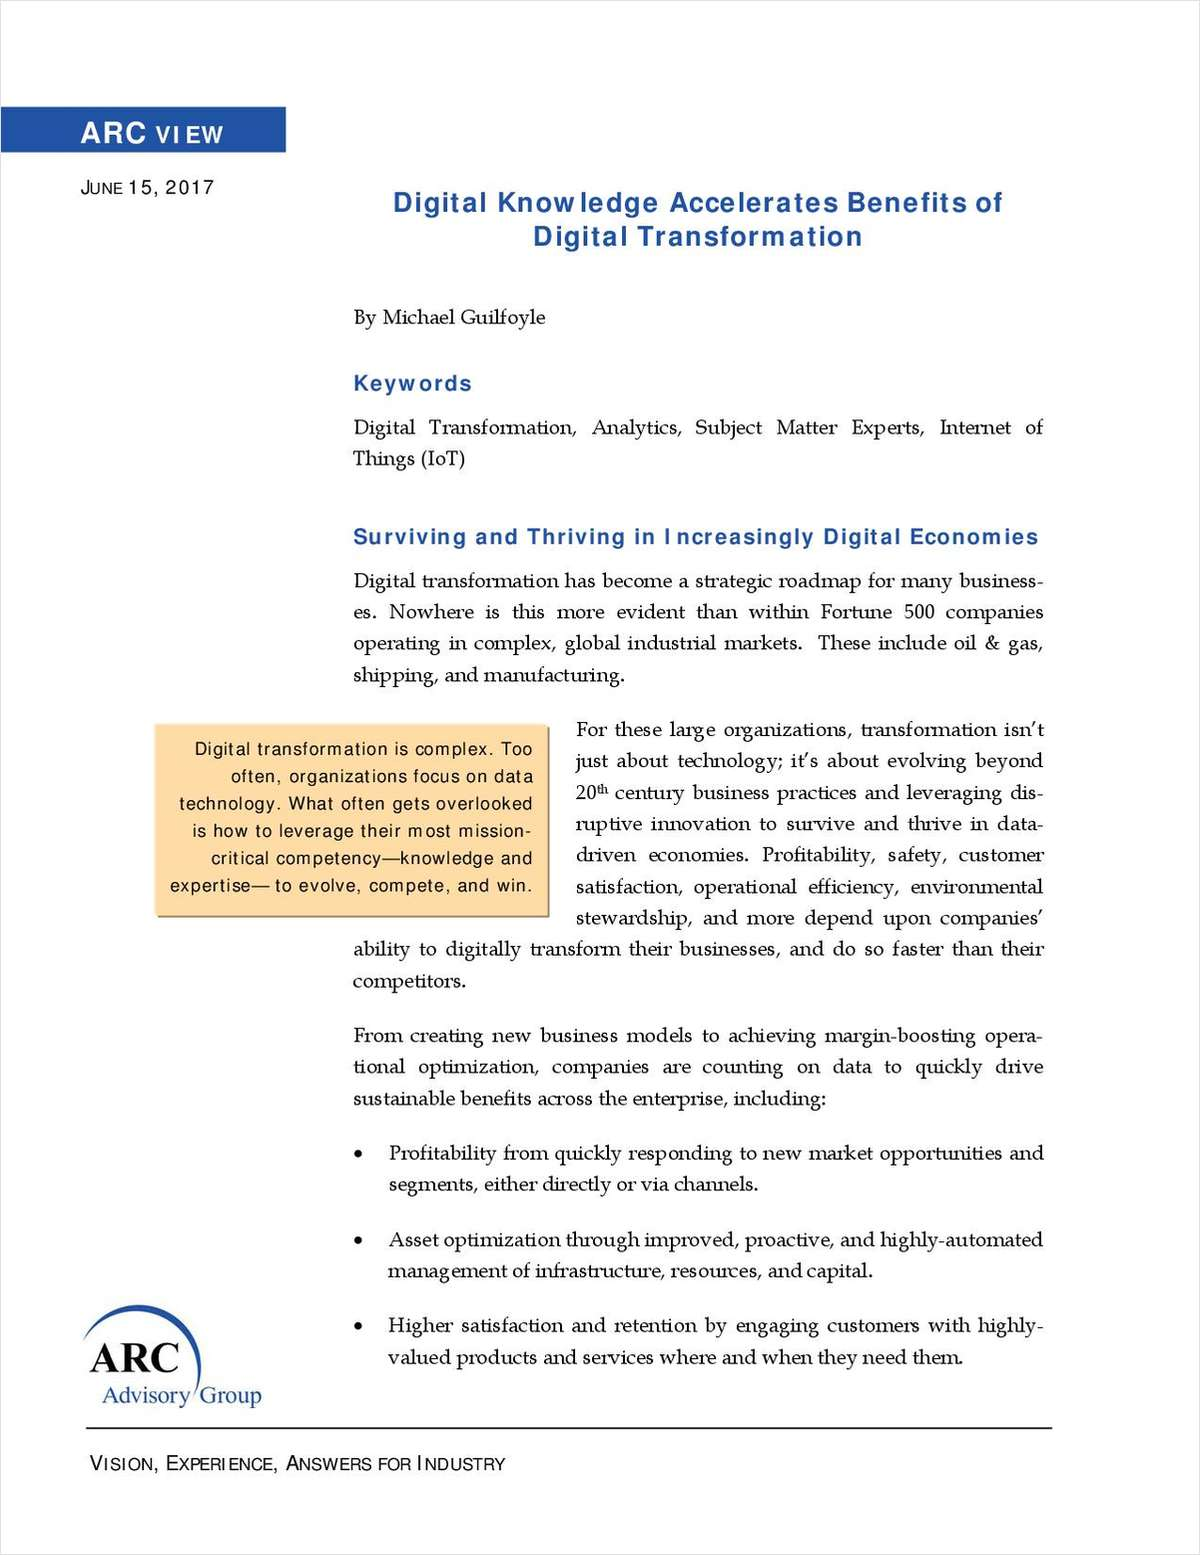 ARC Advisory Group: Digital Knowledge Accelerates Benefits of Digital Transformation